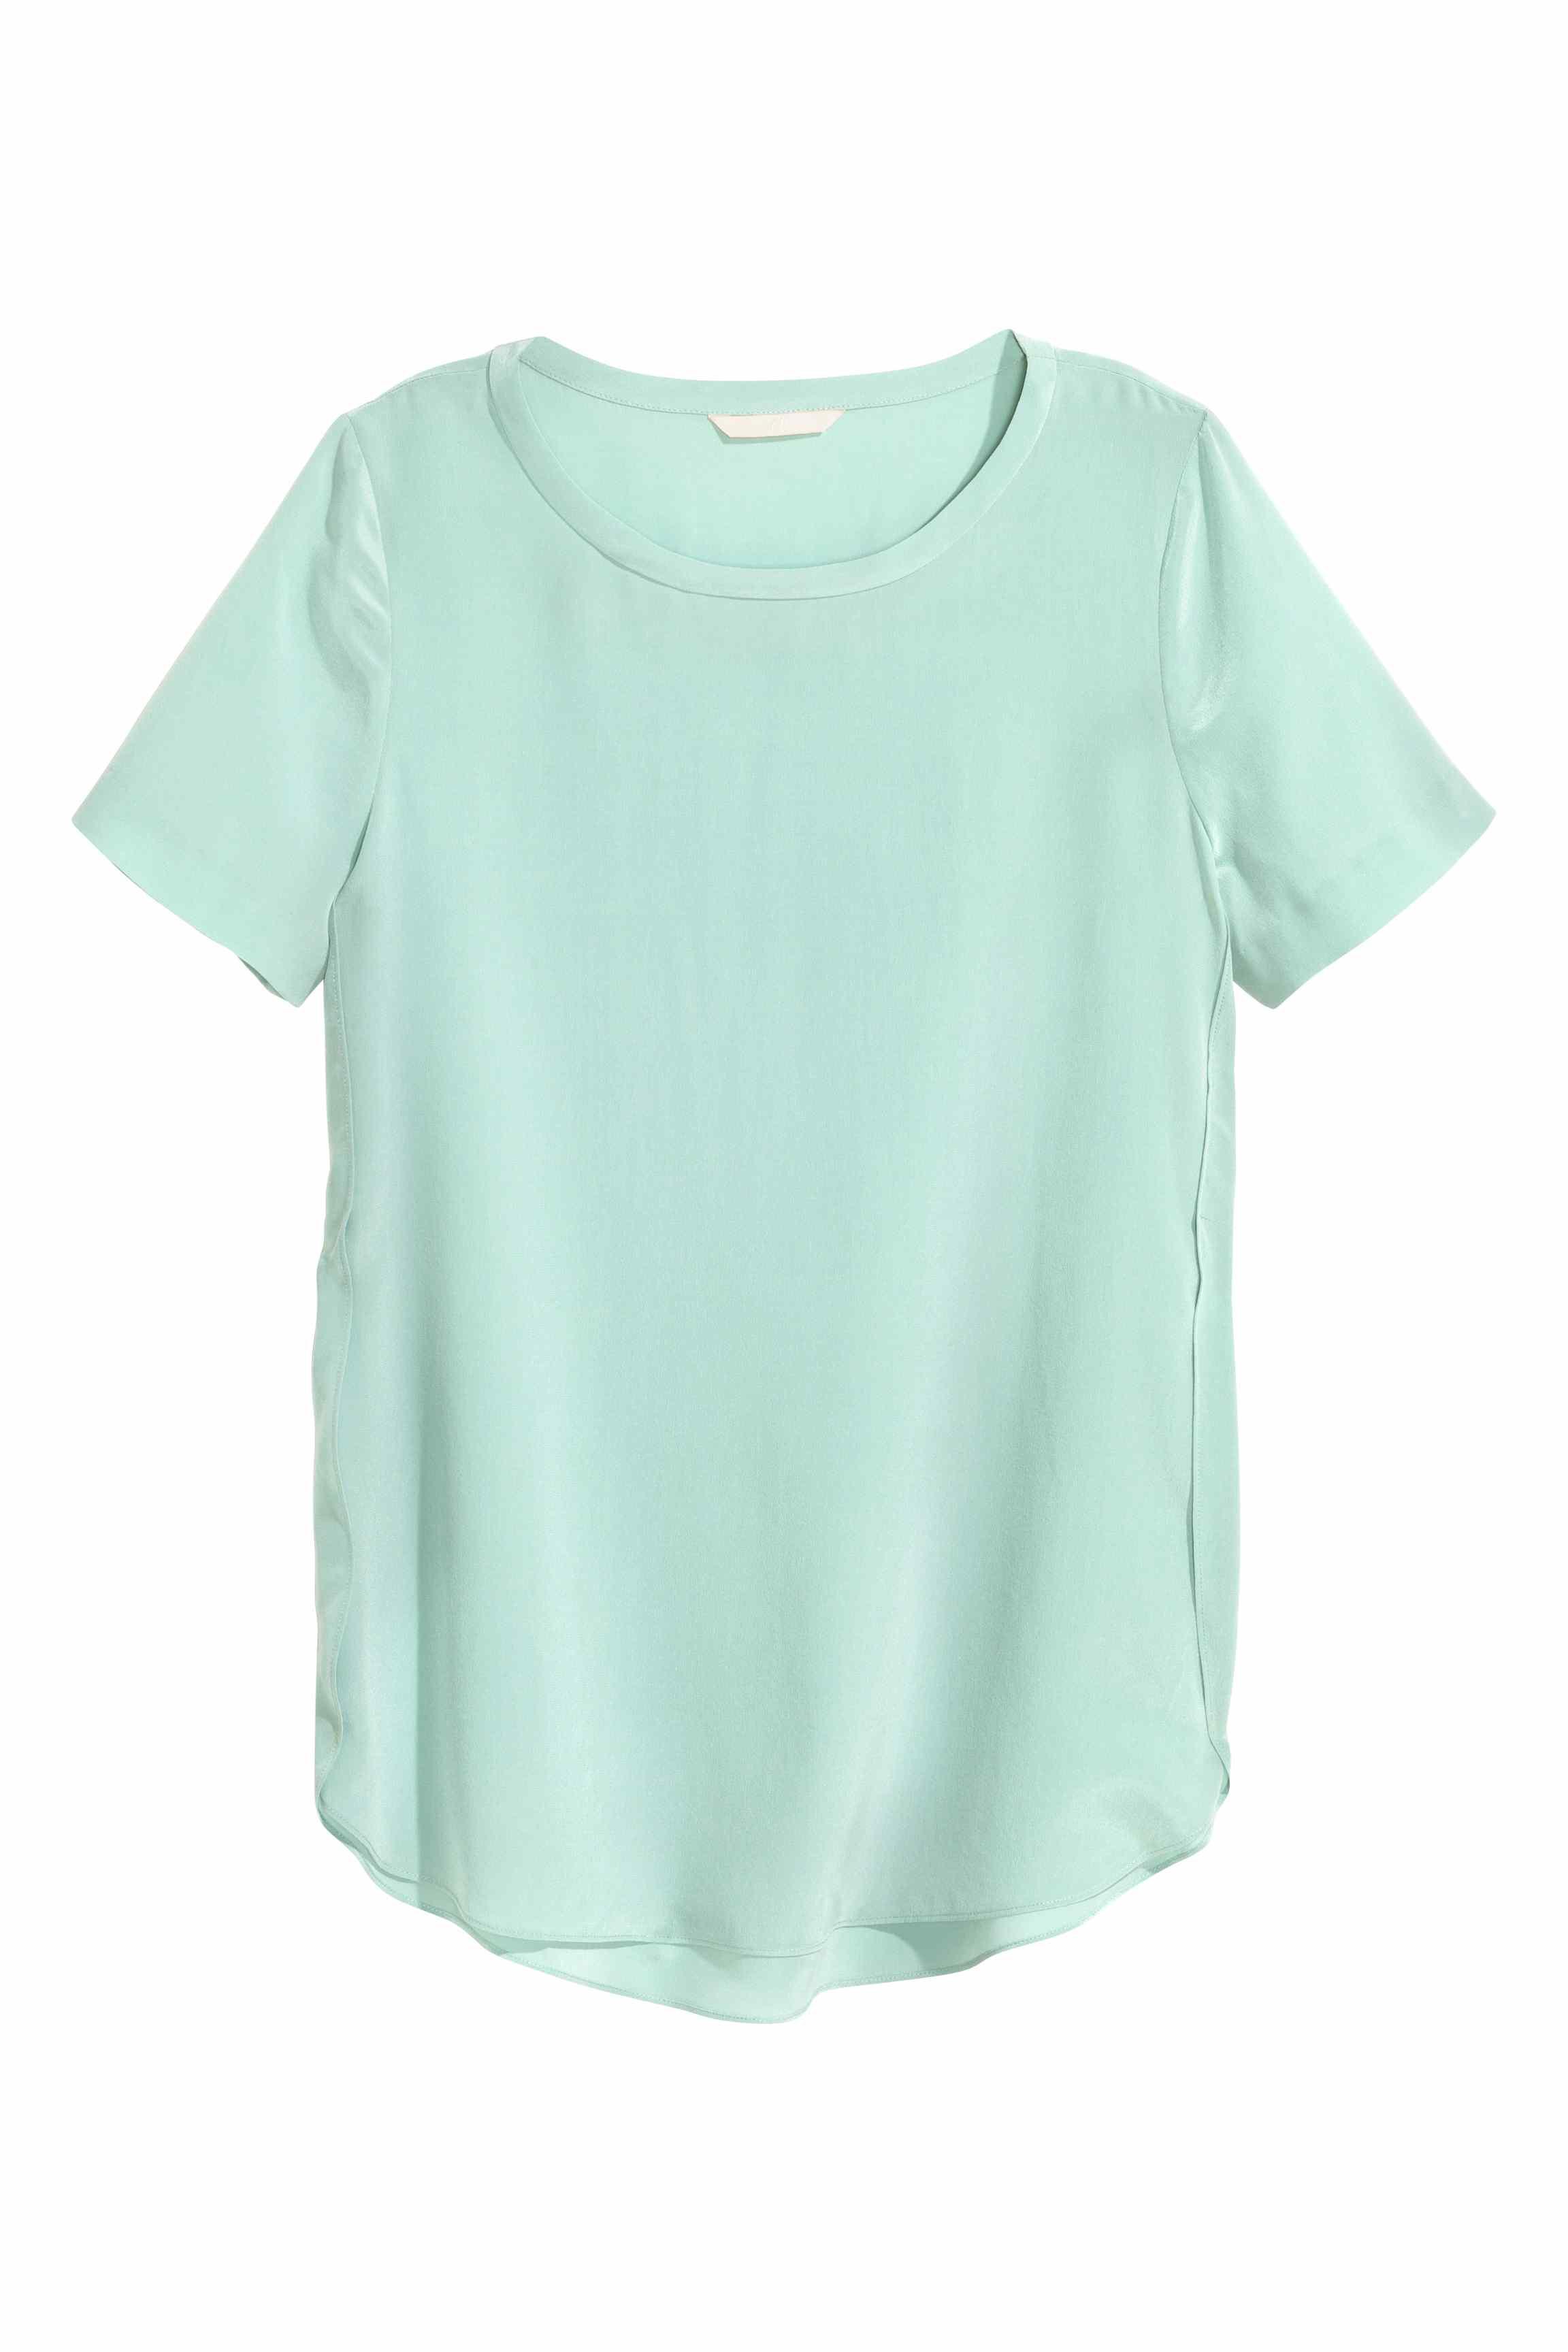 Green Blouse H&M 19